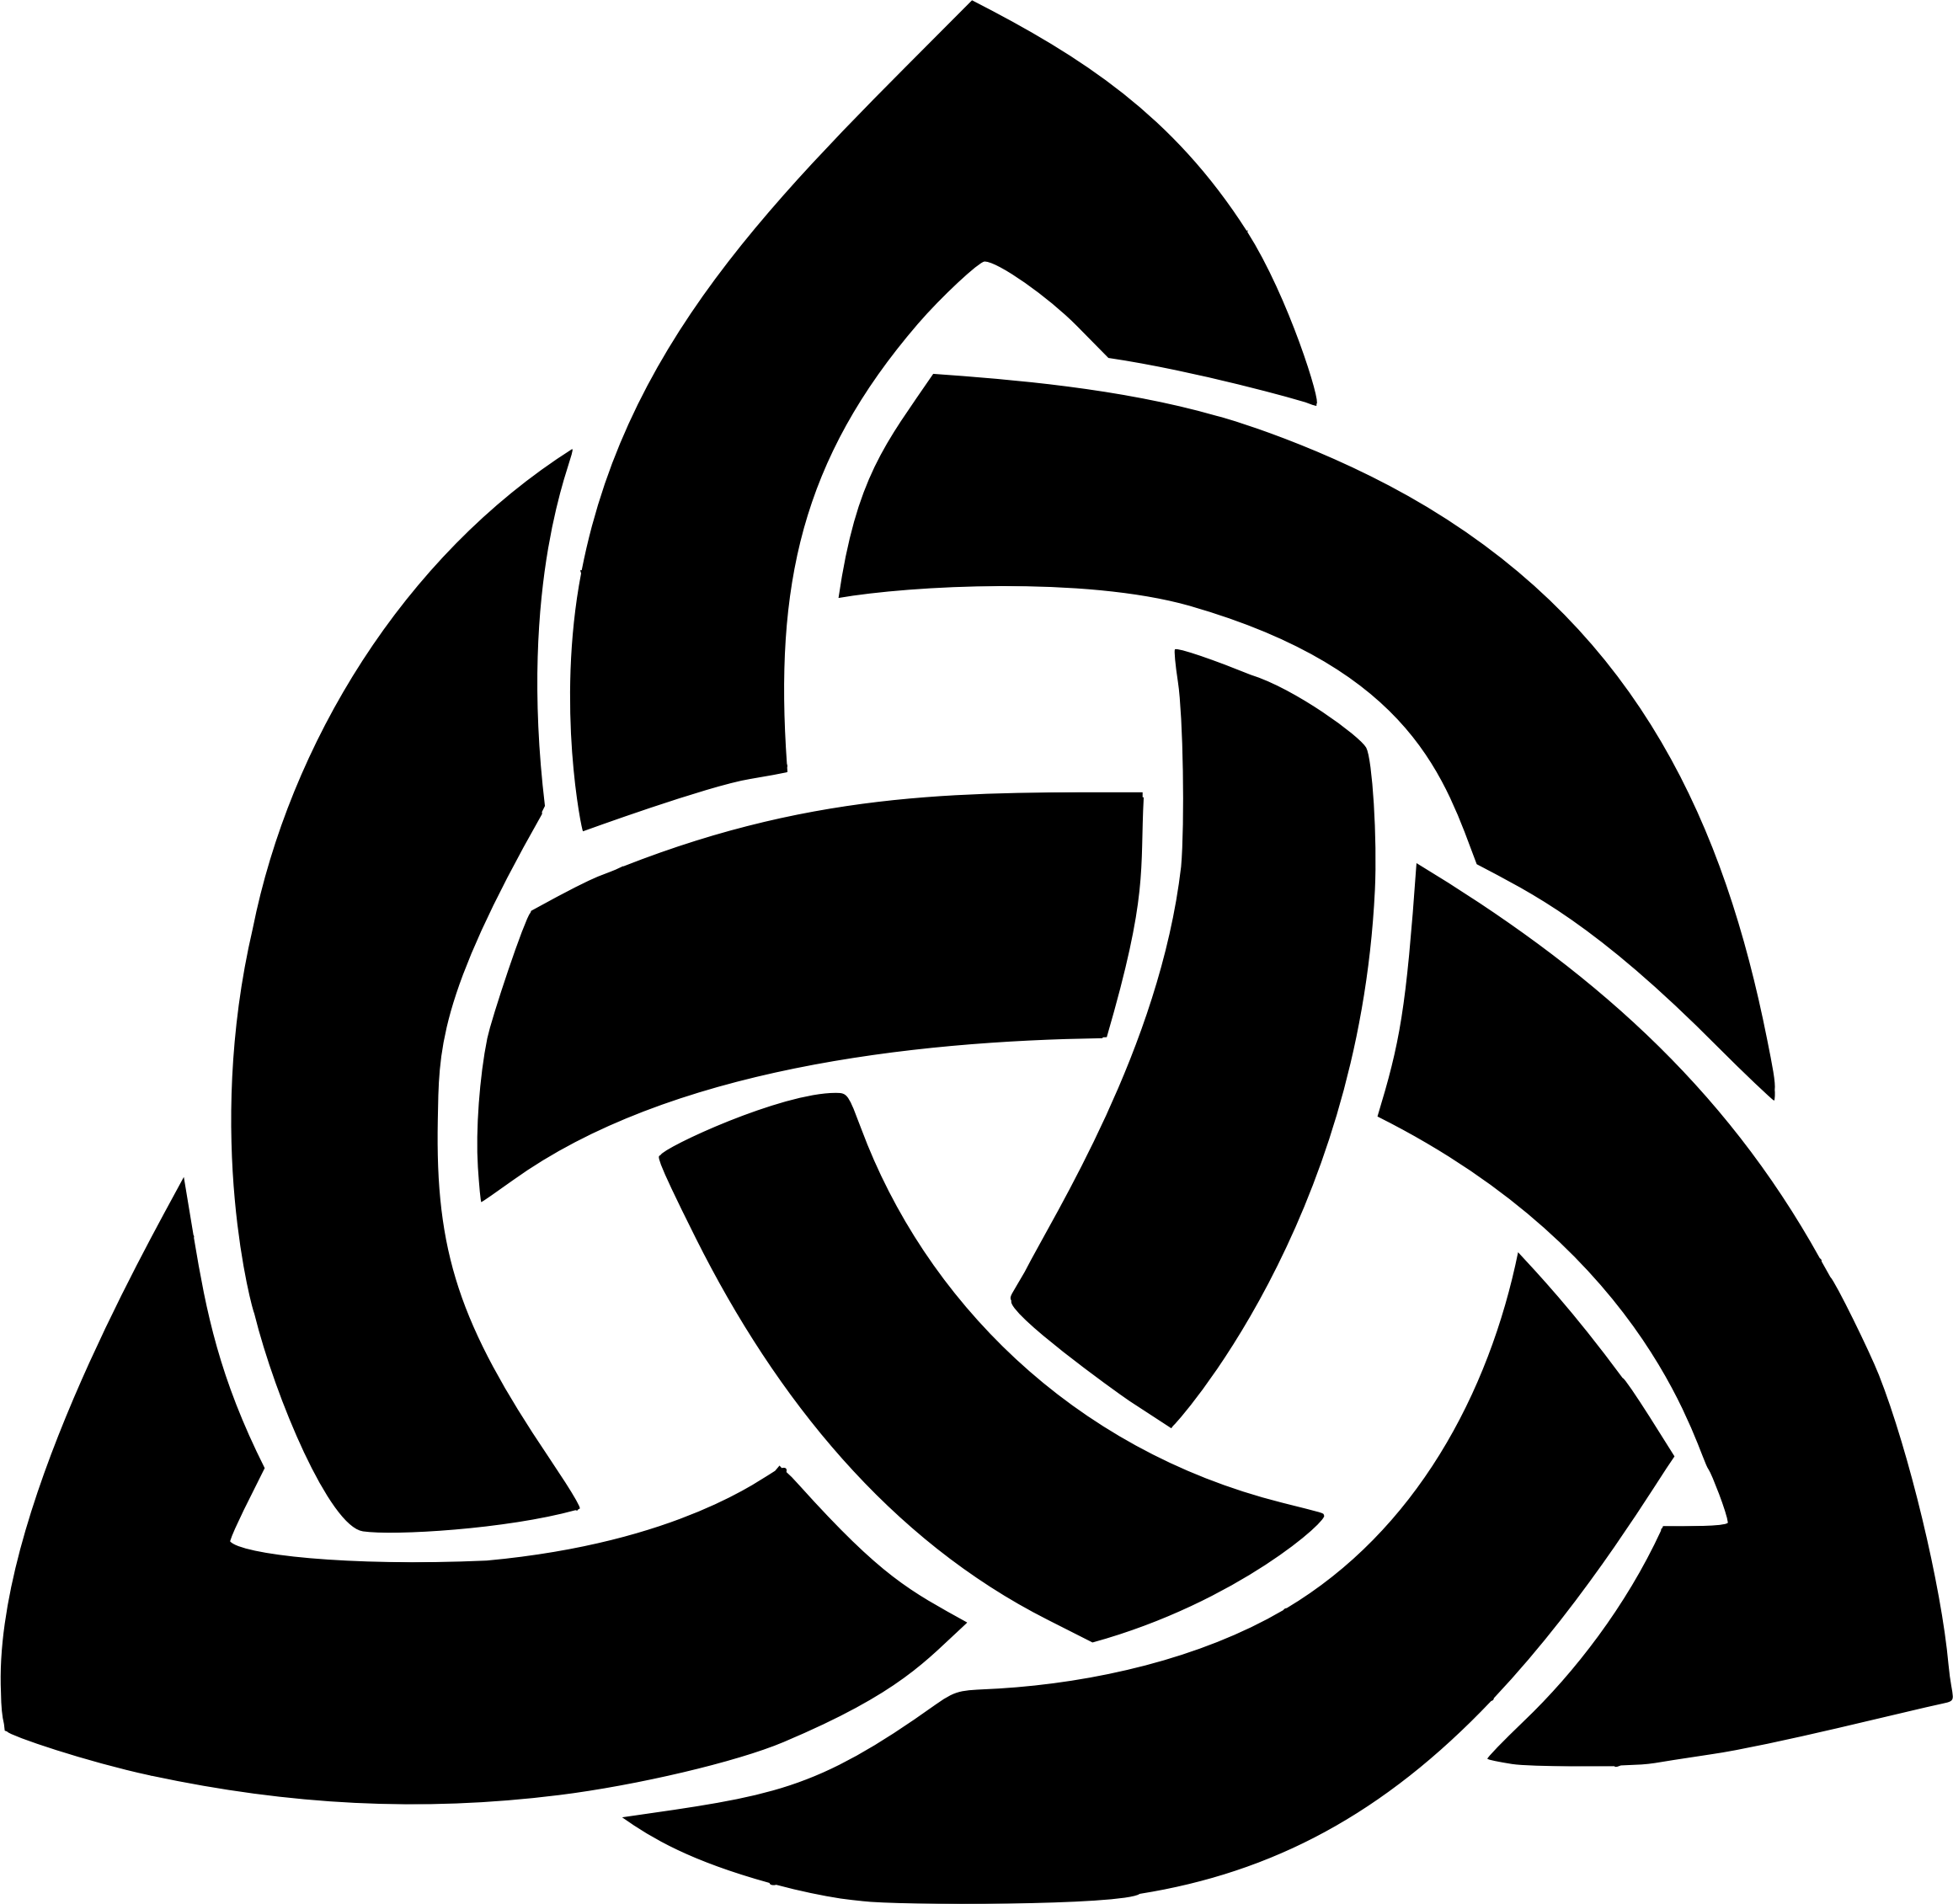 clip art free stock Knot optimized big image. Celtic clipart celtic symbol.